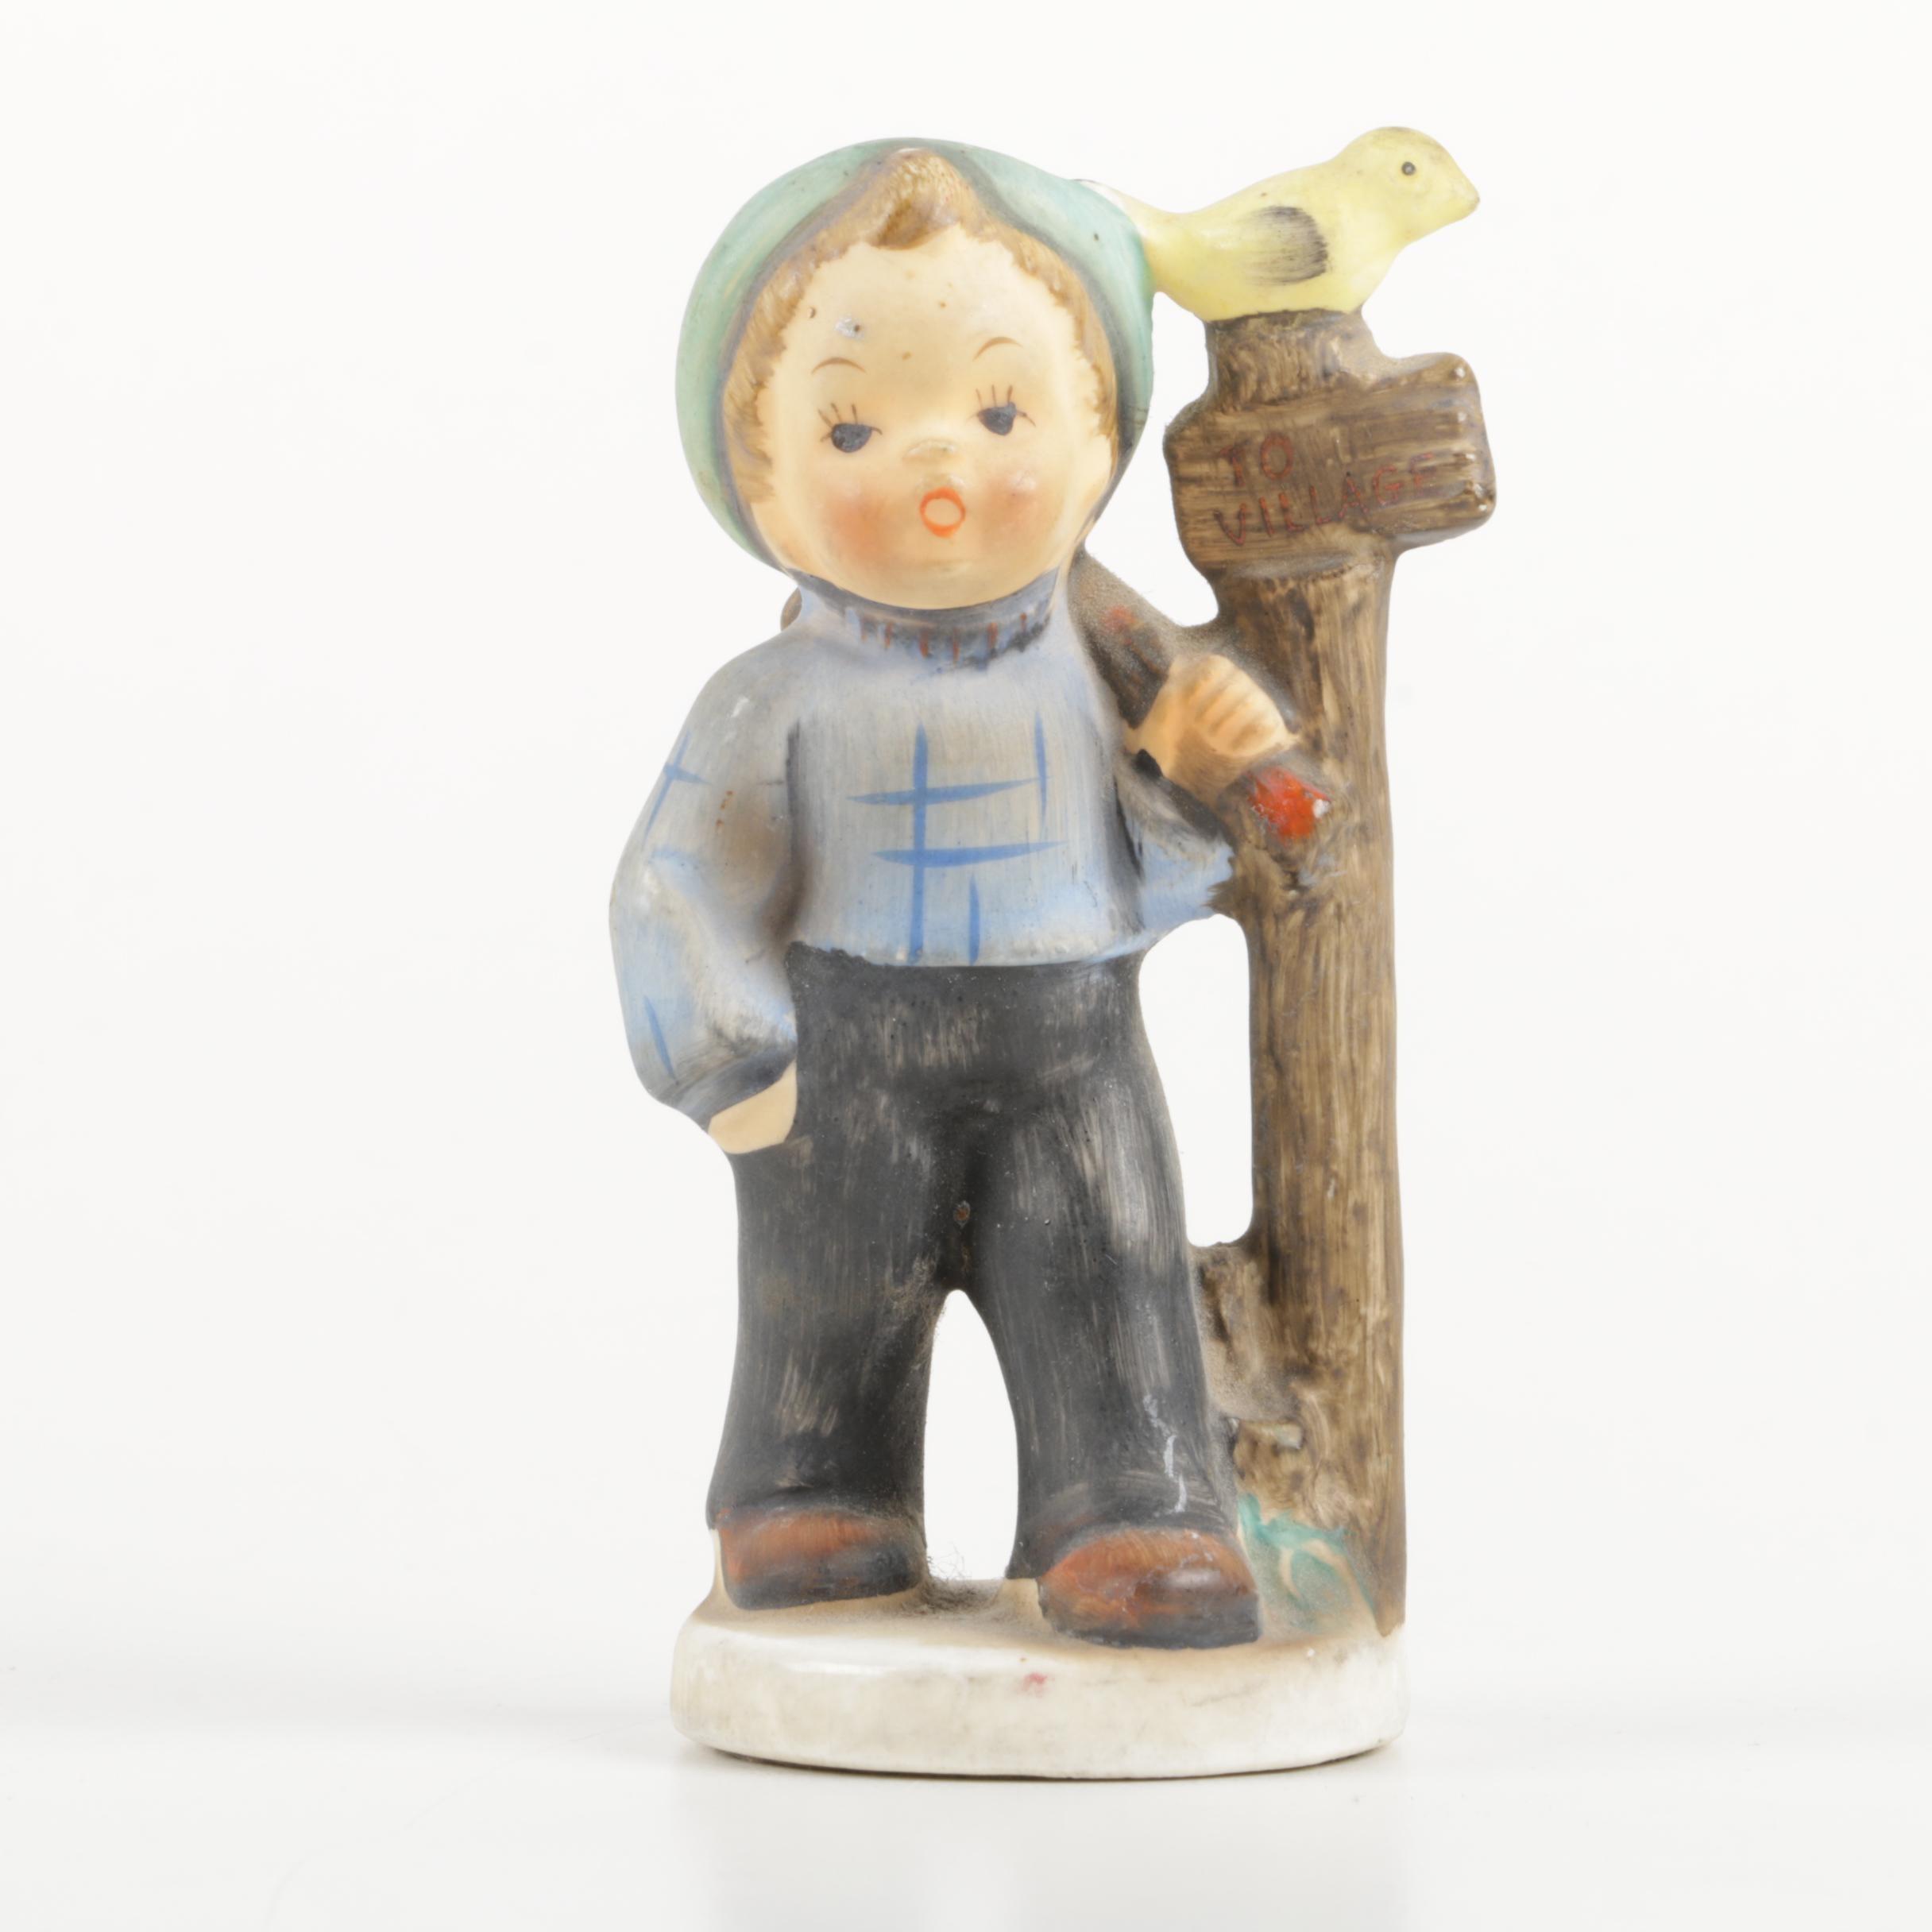 Hummel Figurine of Wandering Boy